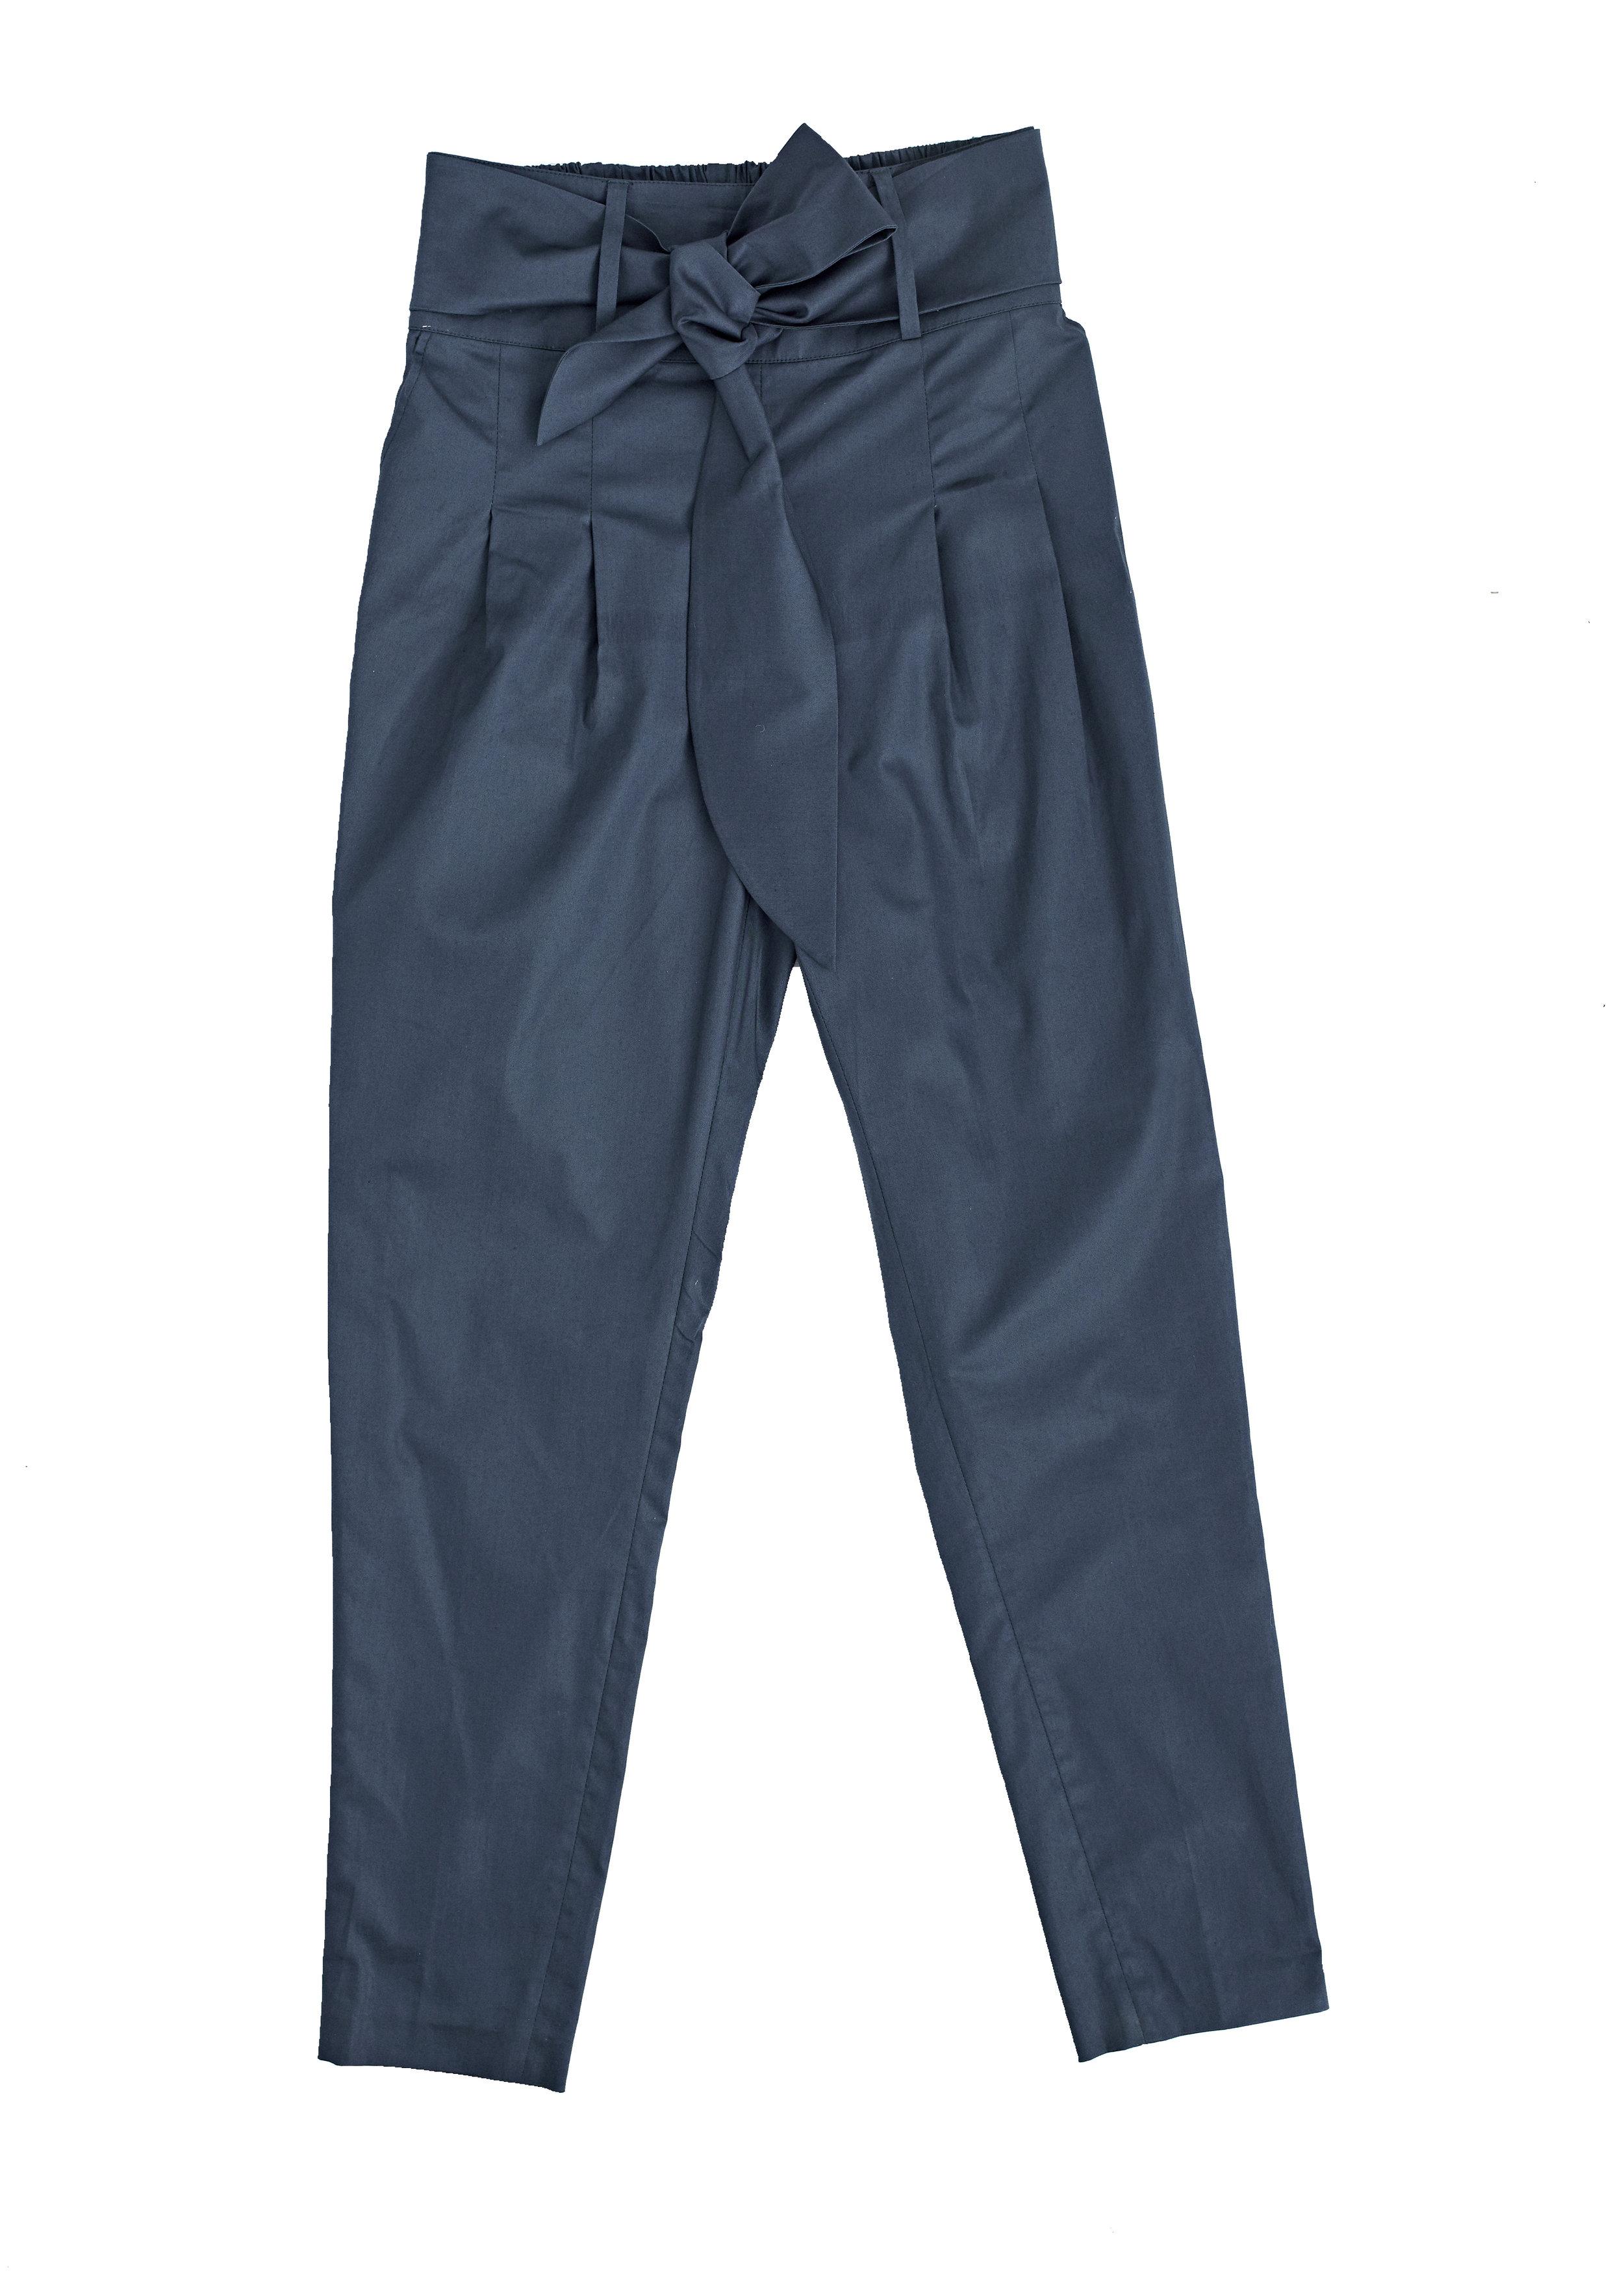 High waist butterfly pants olors available